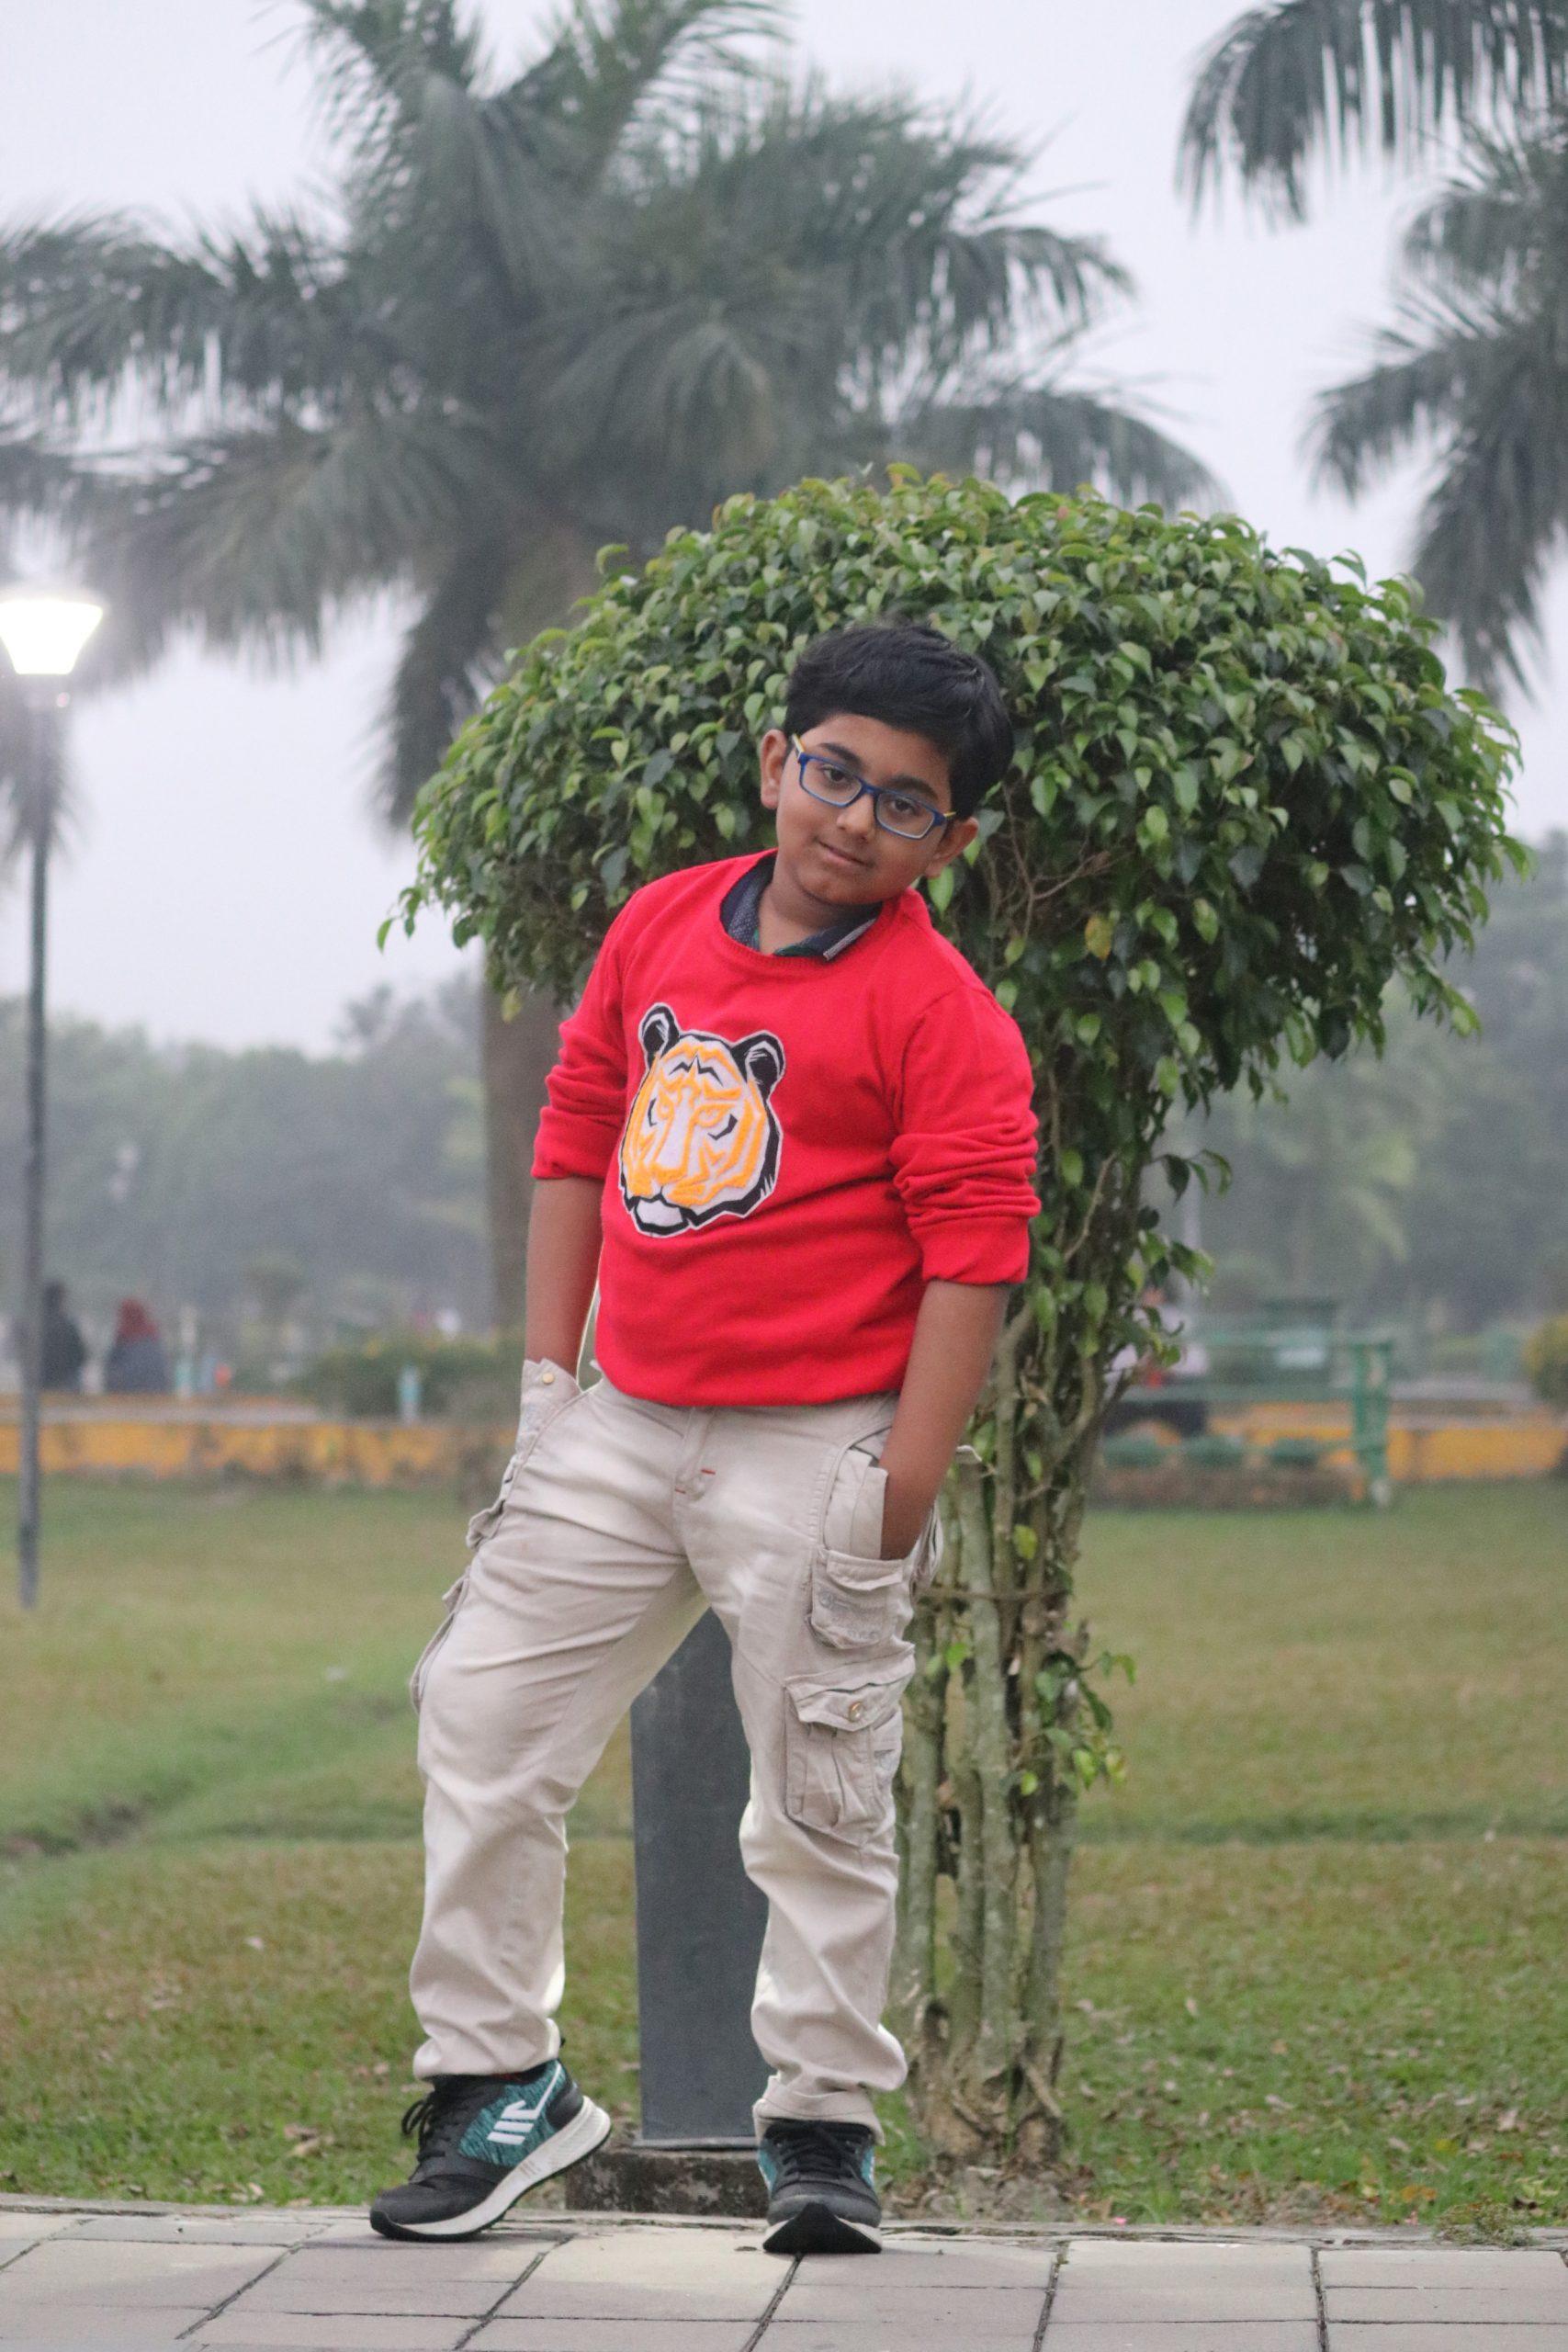 A little boy posing